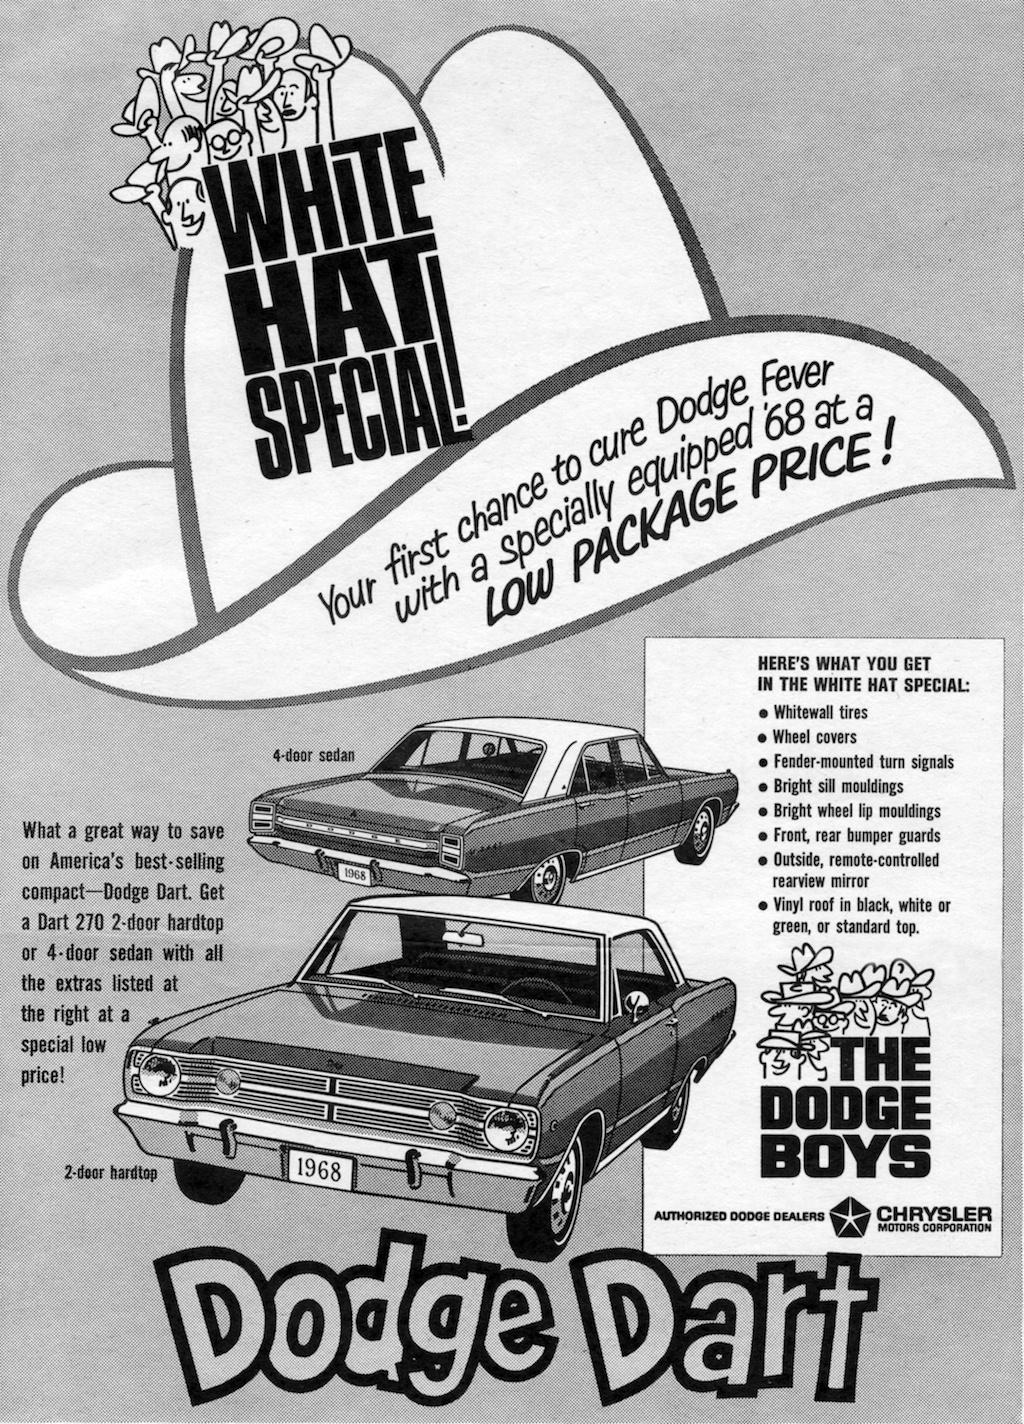 1968 Dodge Dart advertisement